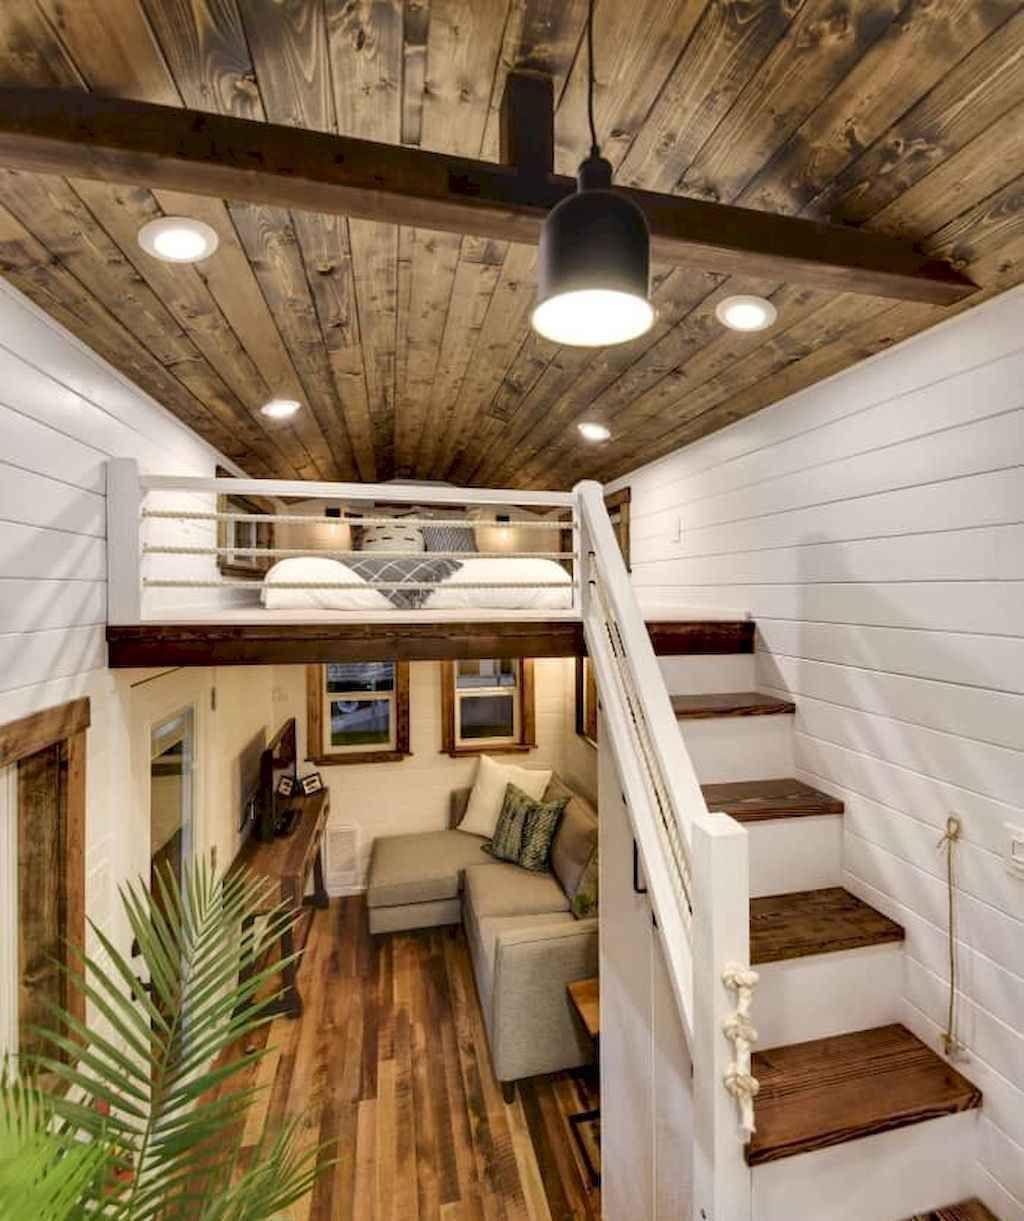 62 Cool Tiny House Interior Design Ideas In 2020 Tiny House Loft